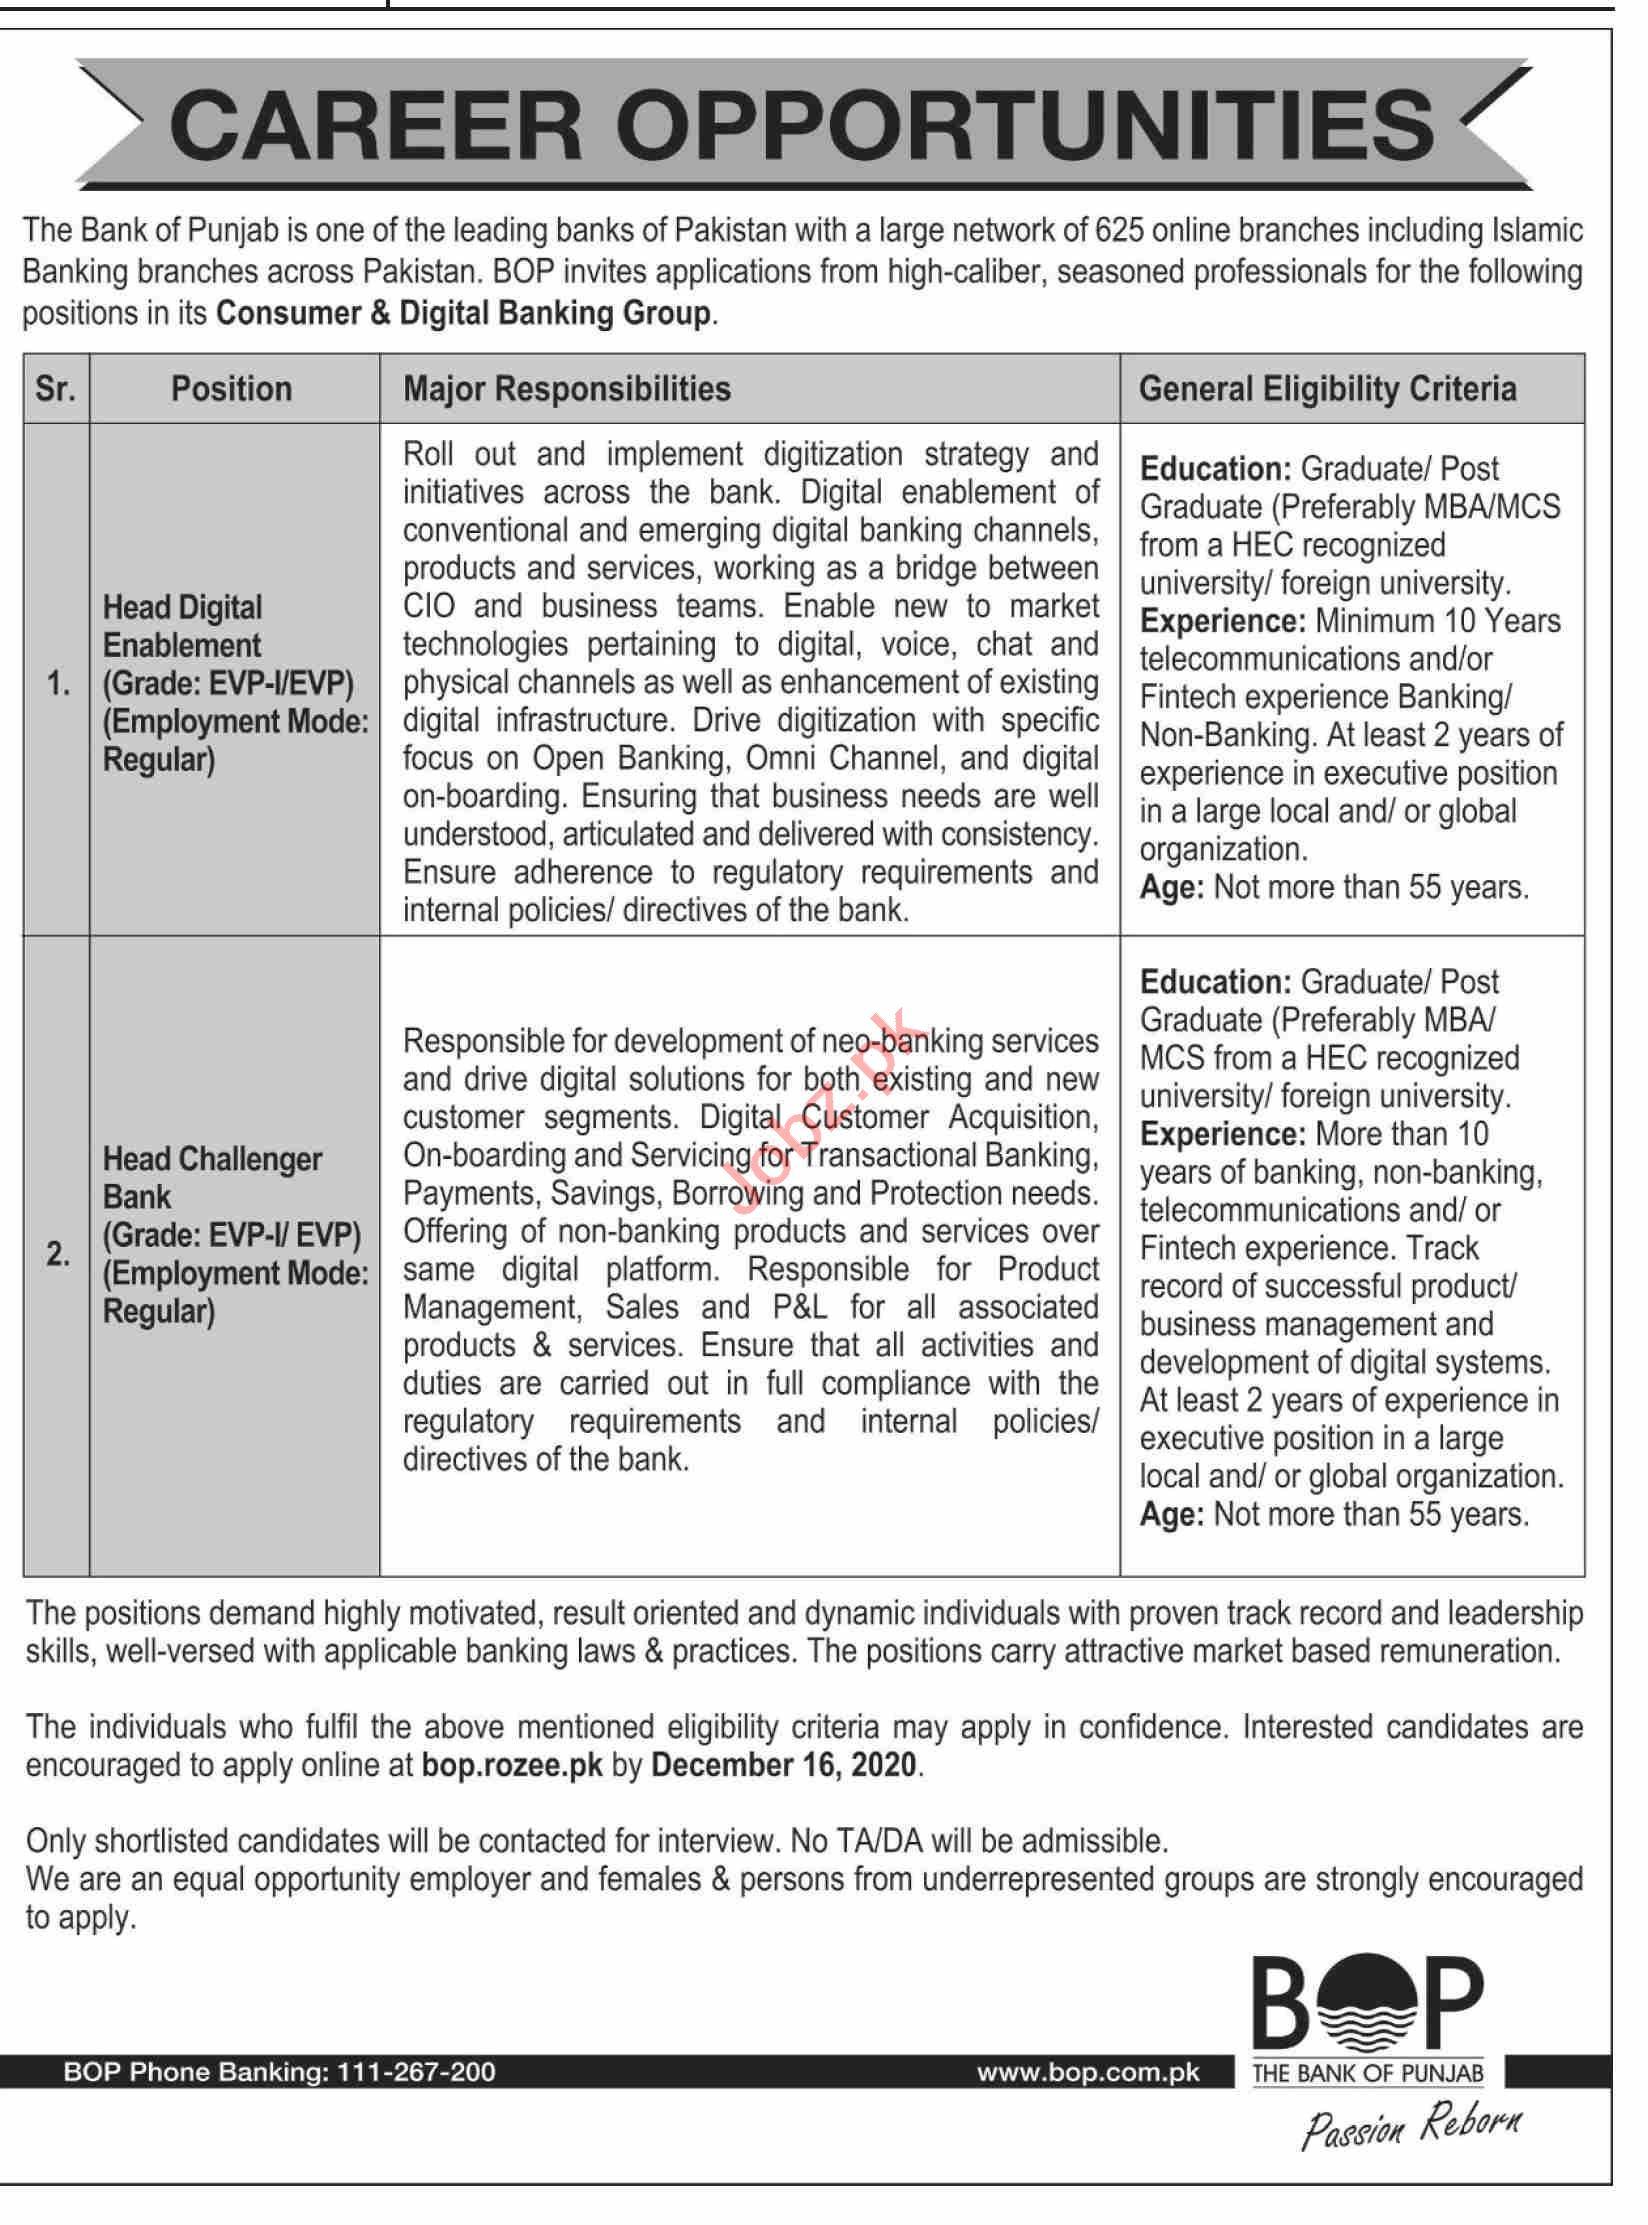 The Bank of Punjab BOP Jobs 2020 for Head Challenger Bank